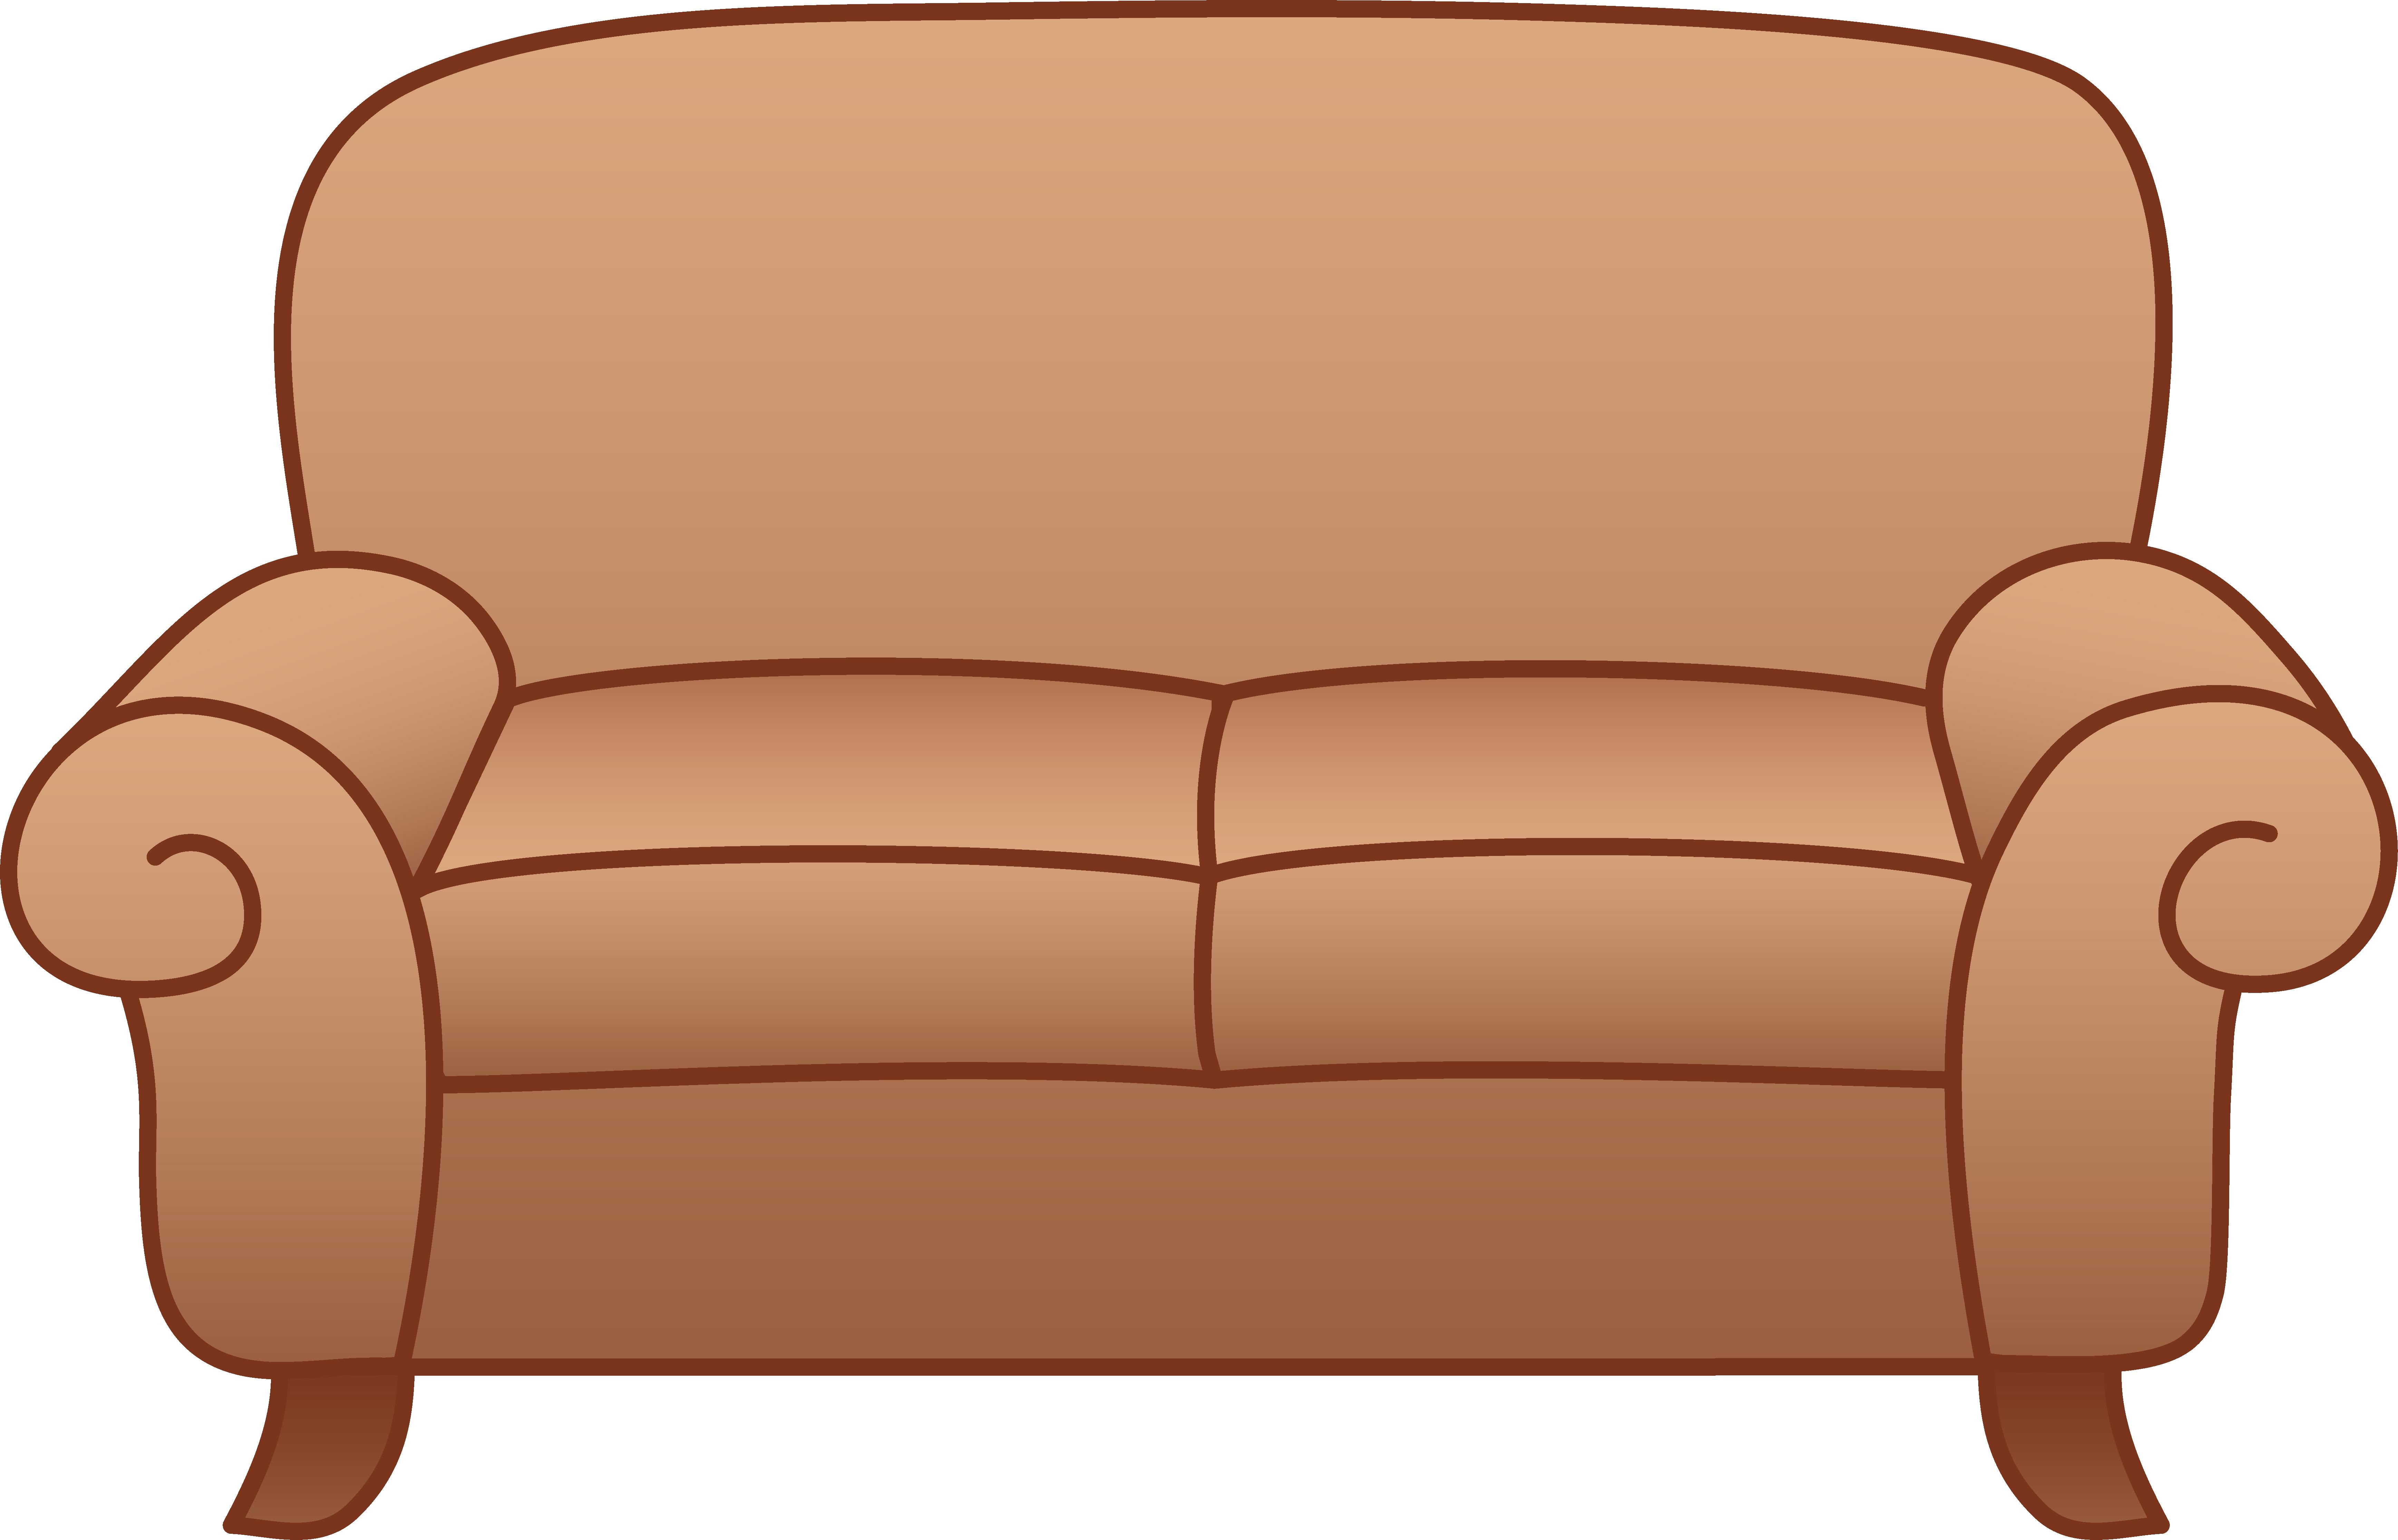 clip art transparent library sofa clipart printable #49374791